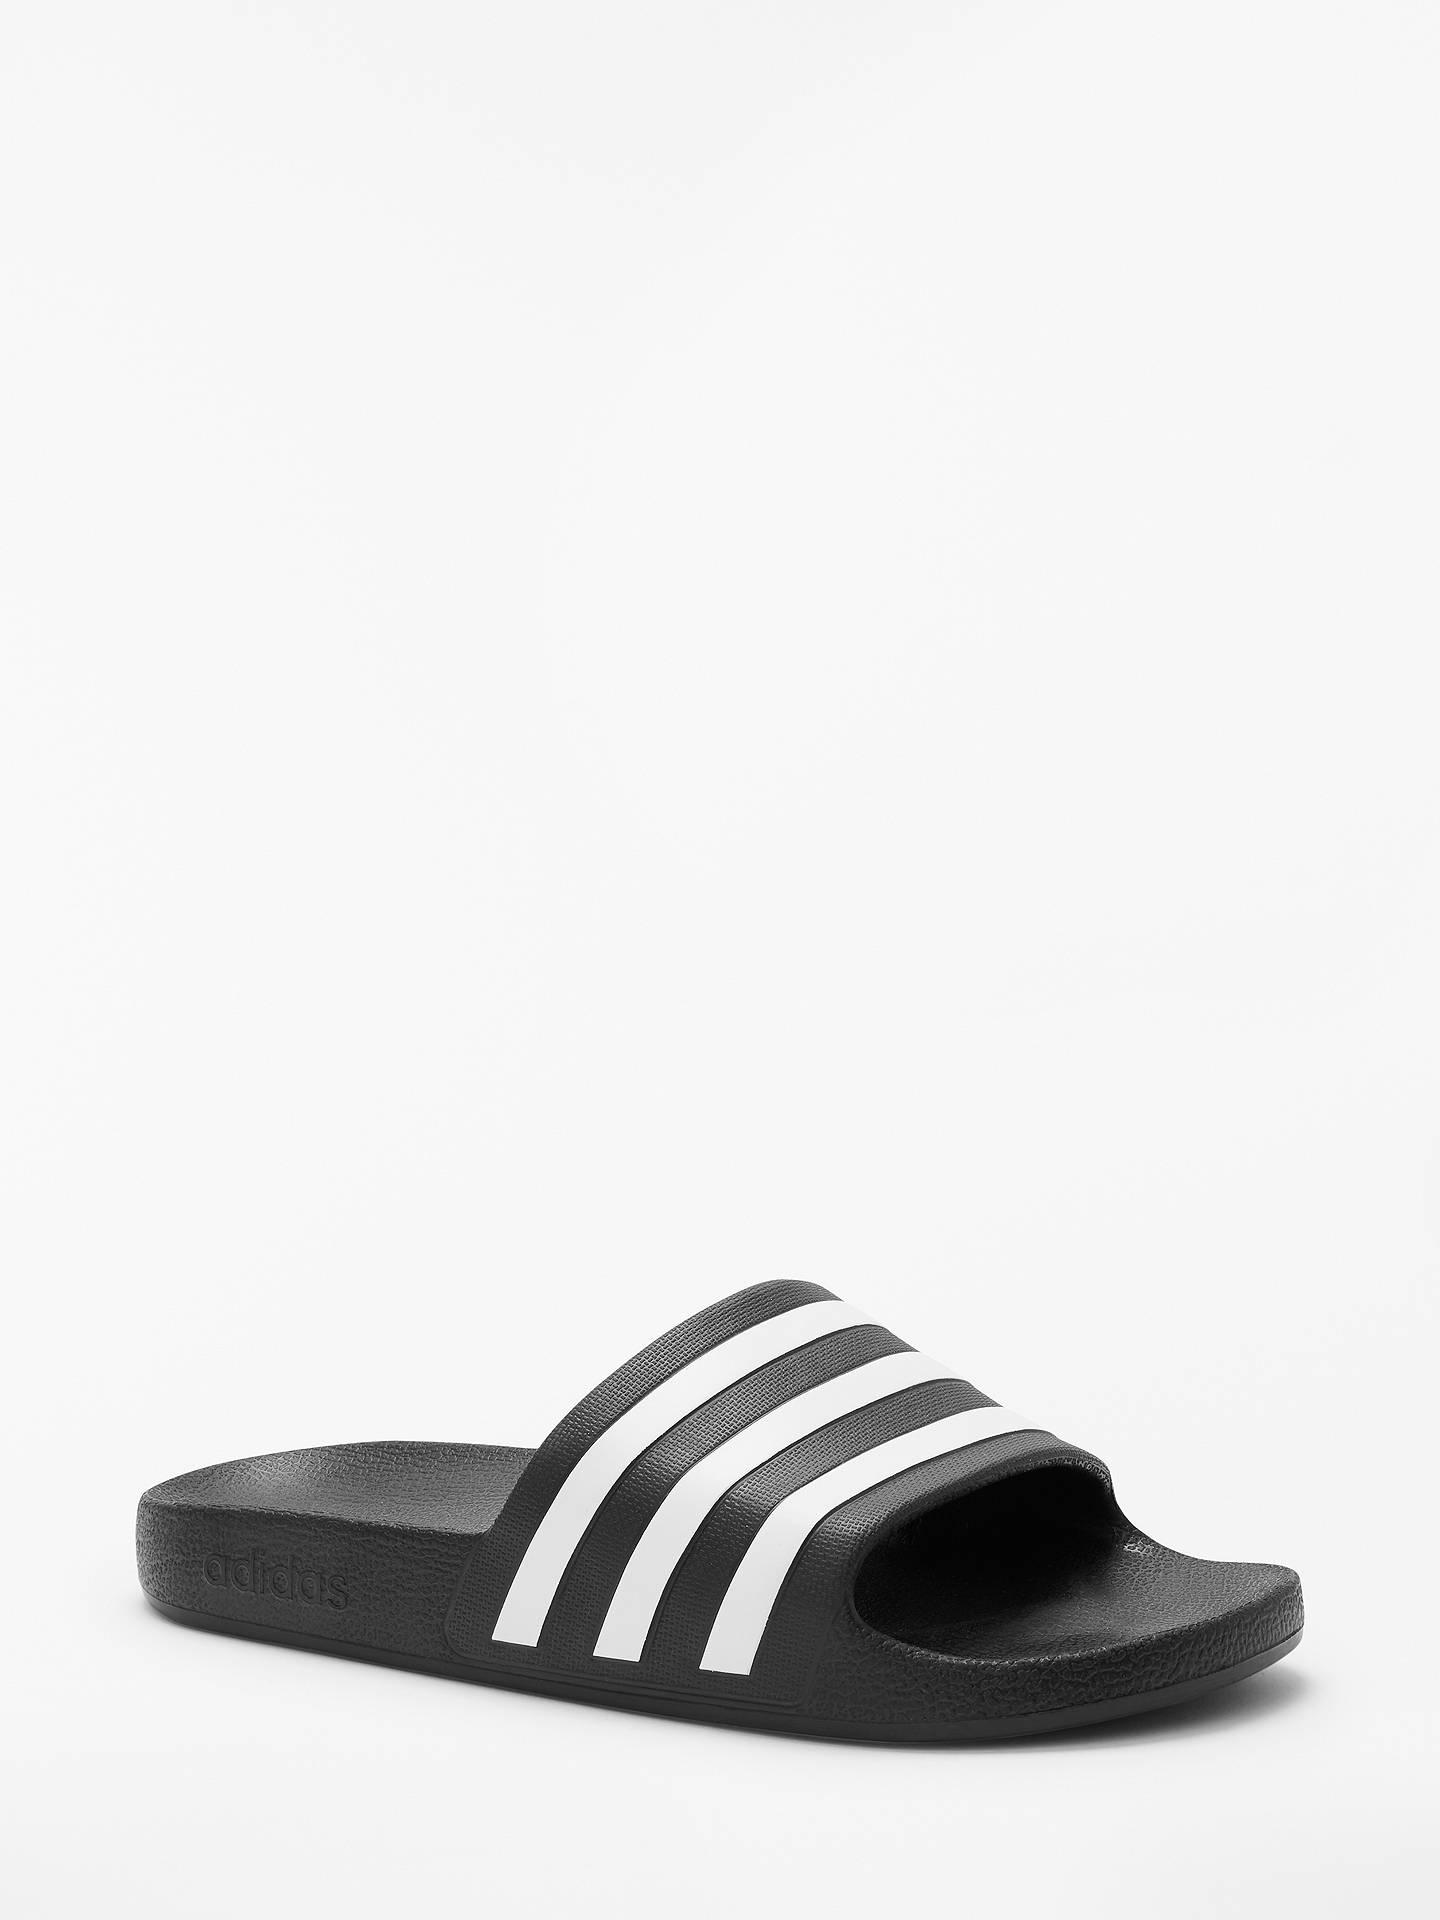 sports shoes a686e ab1ed Buy adidas Adilette Aqua Slides Slippers, Black White, 7 Online at johnlewis .